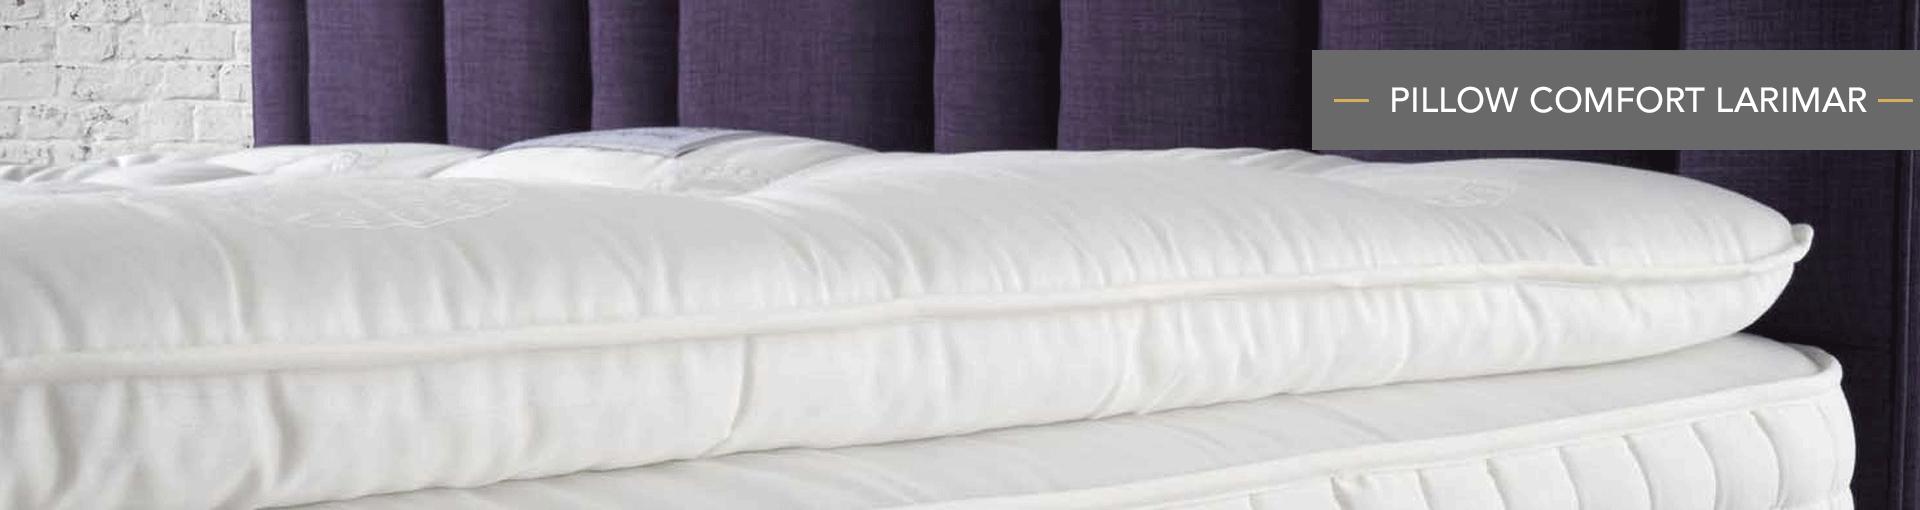 Pillow Comfort Larimar Banner